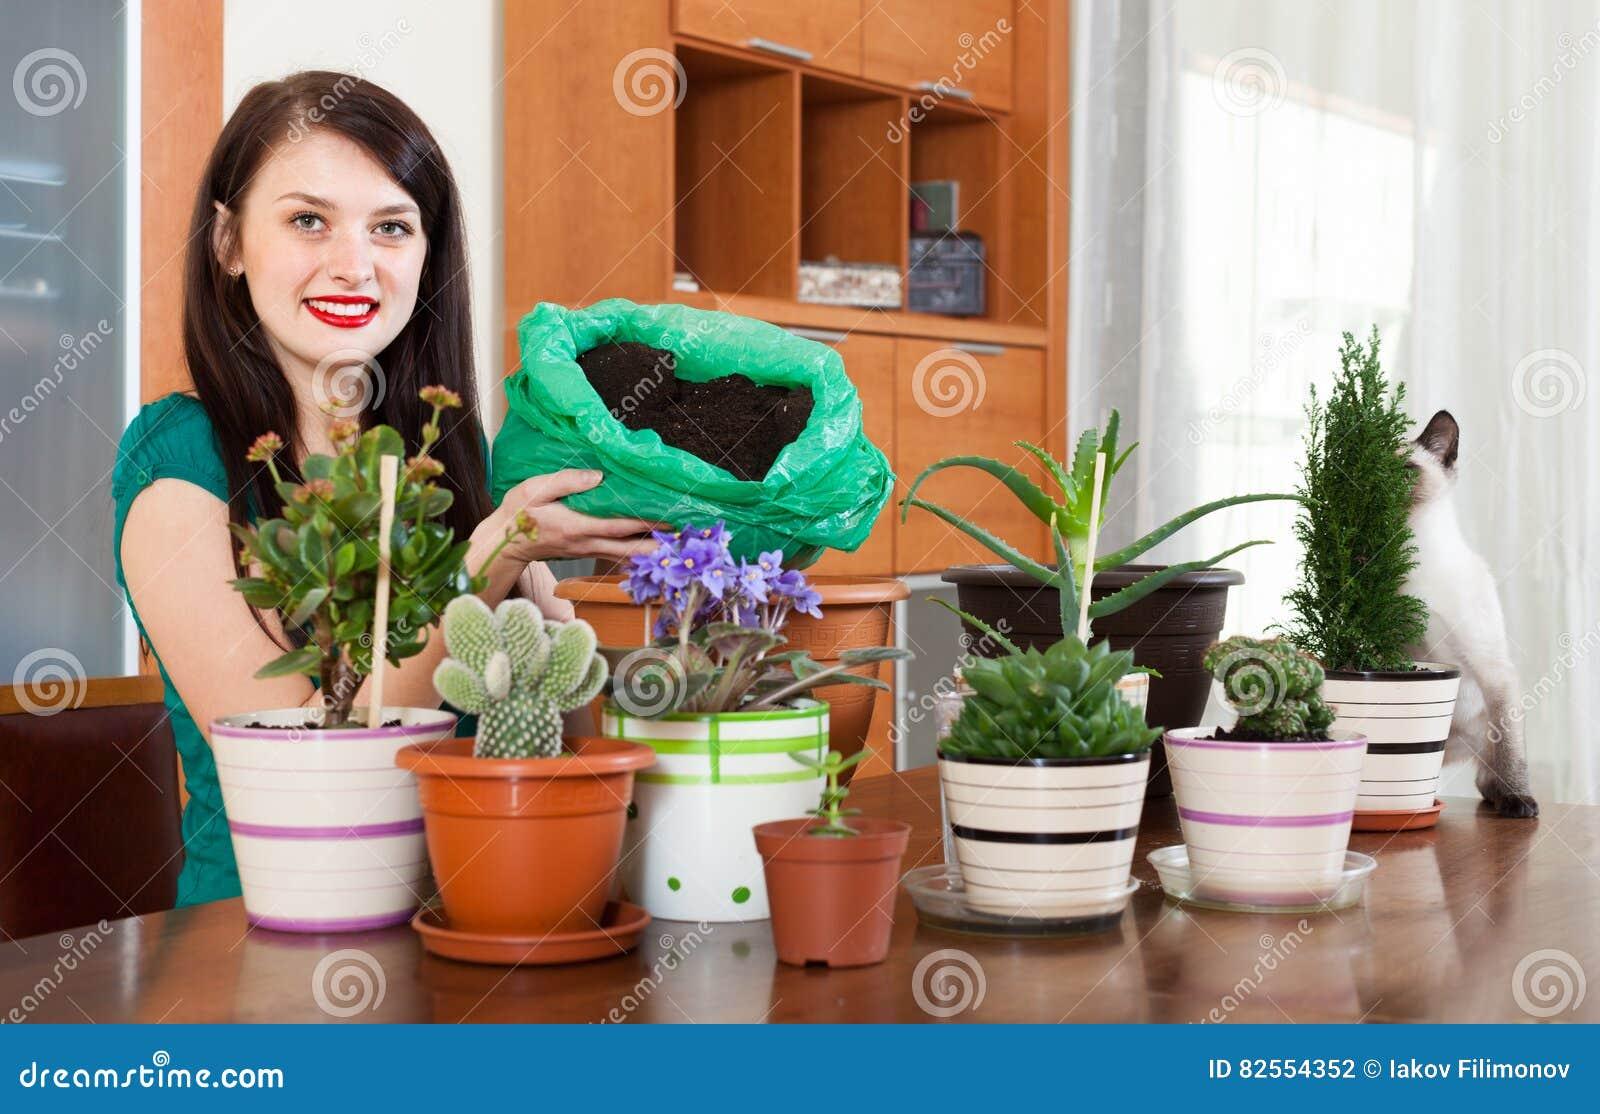 Menina feliz que transplanta flores em pasta